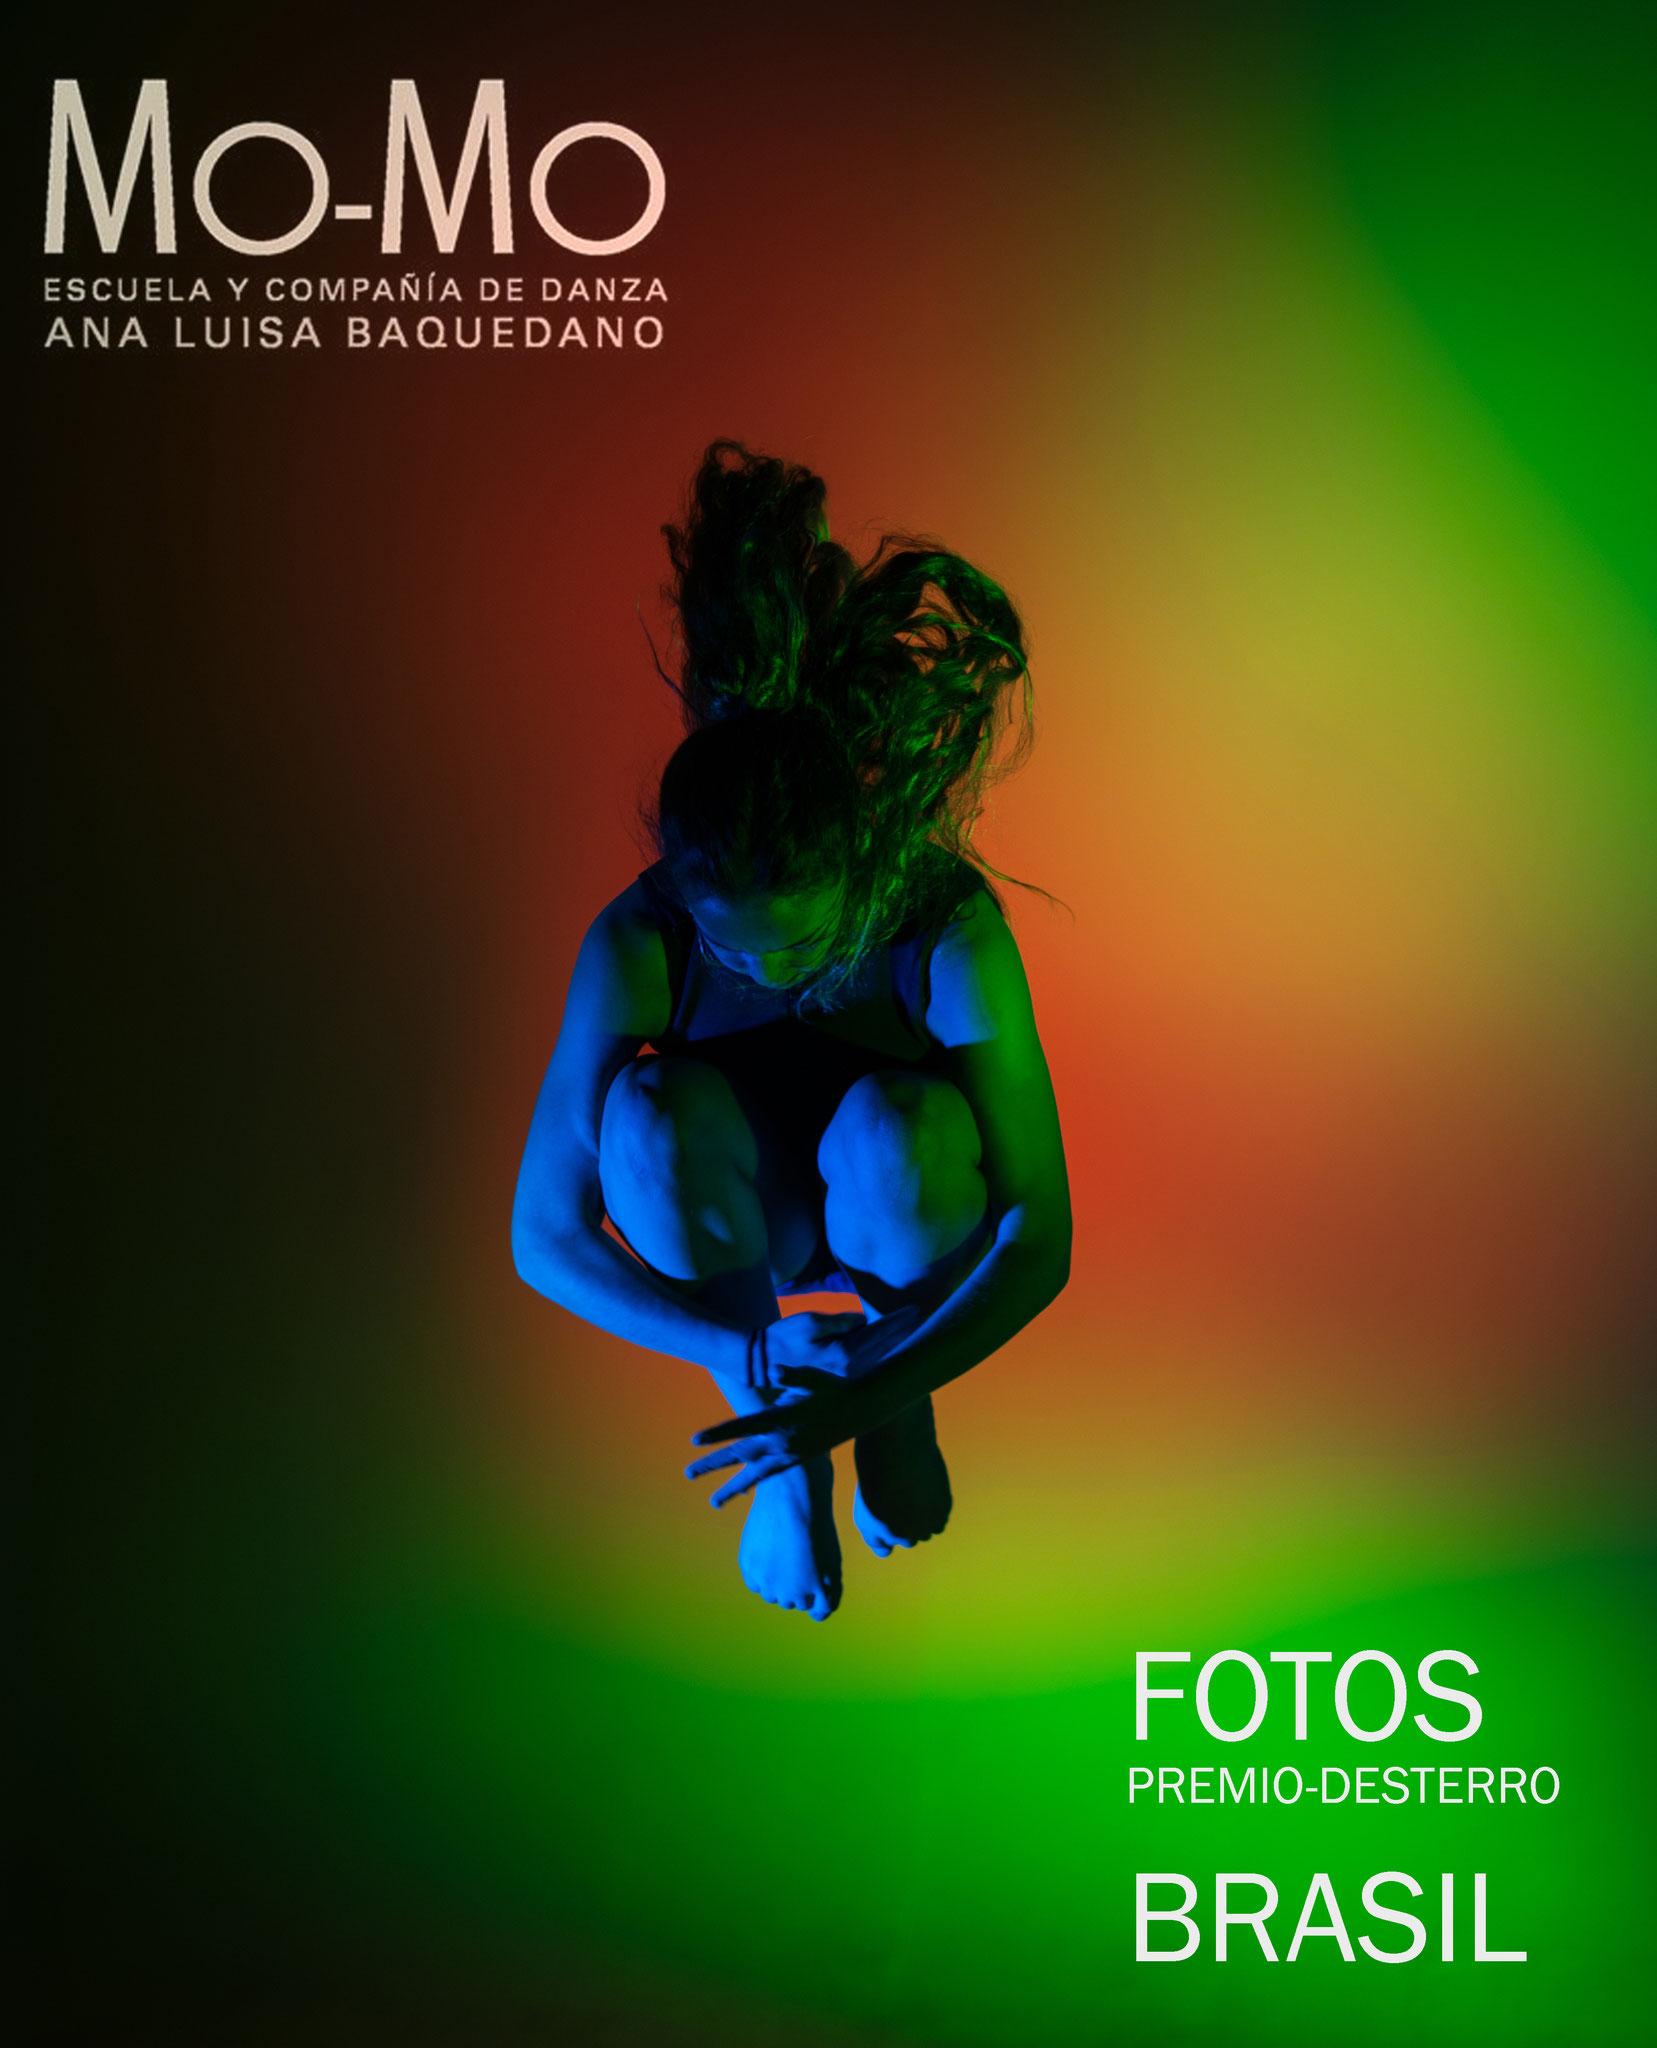 PRESIONA IMAGEN FOTOSMo-Mo PREMIO DESTERRO BRASIL